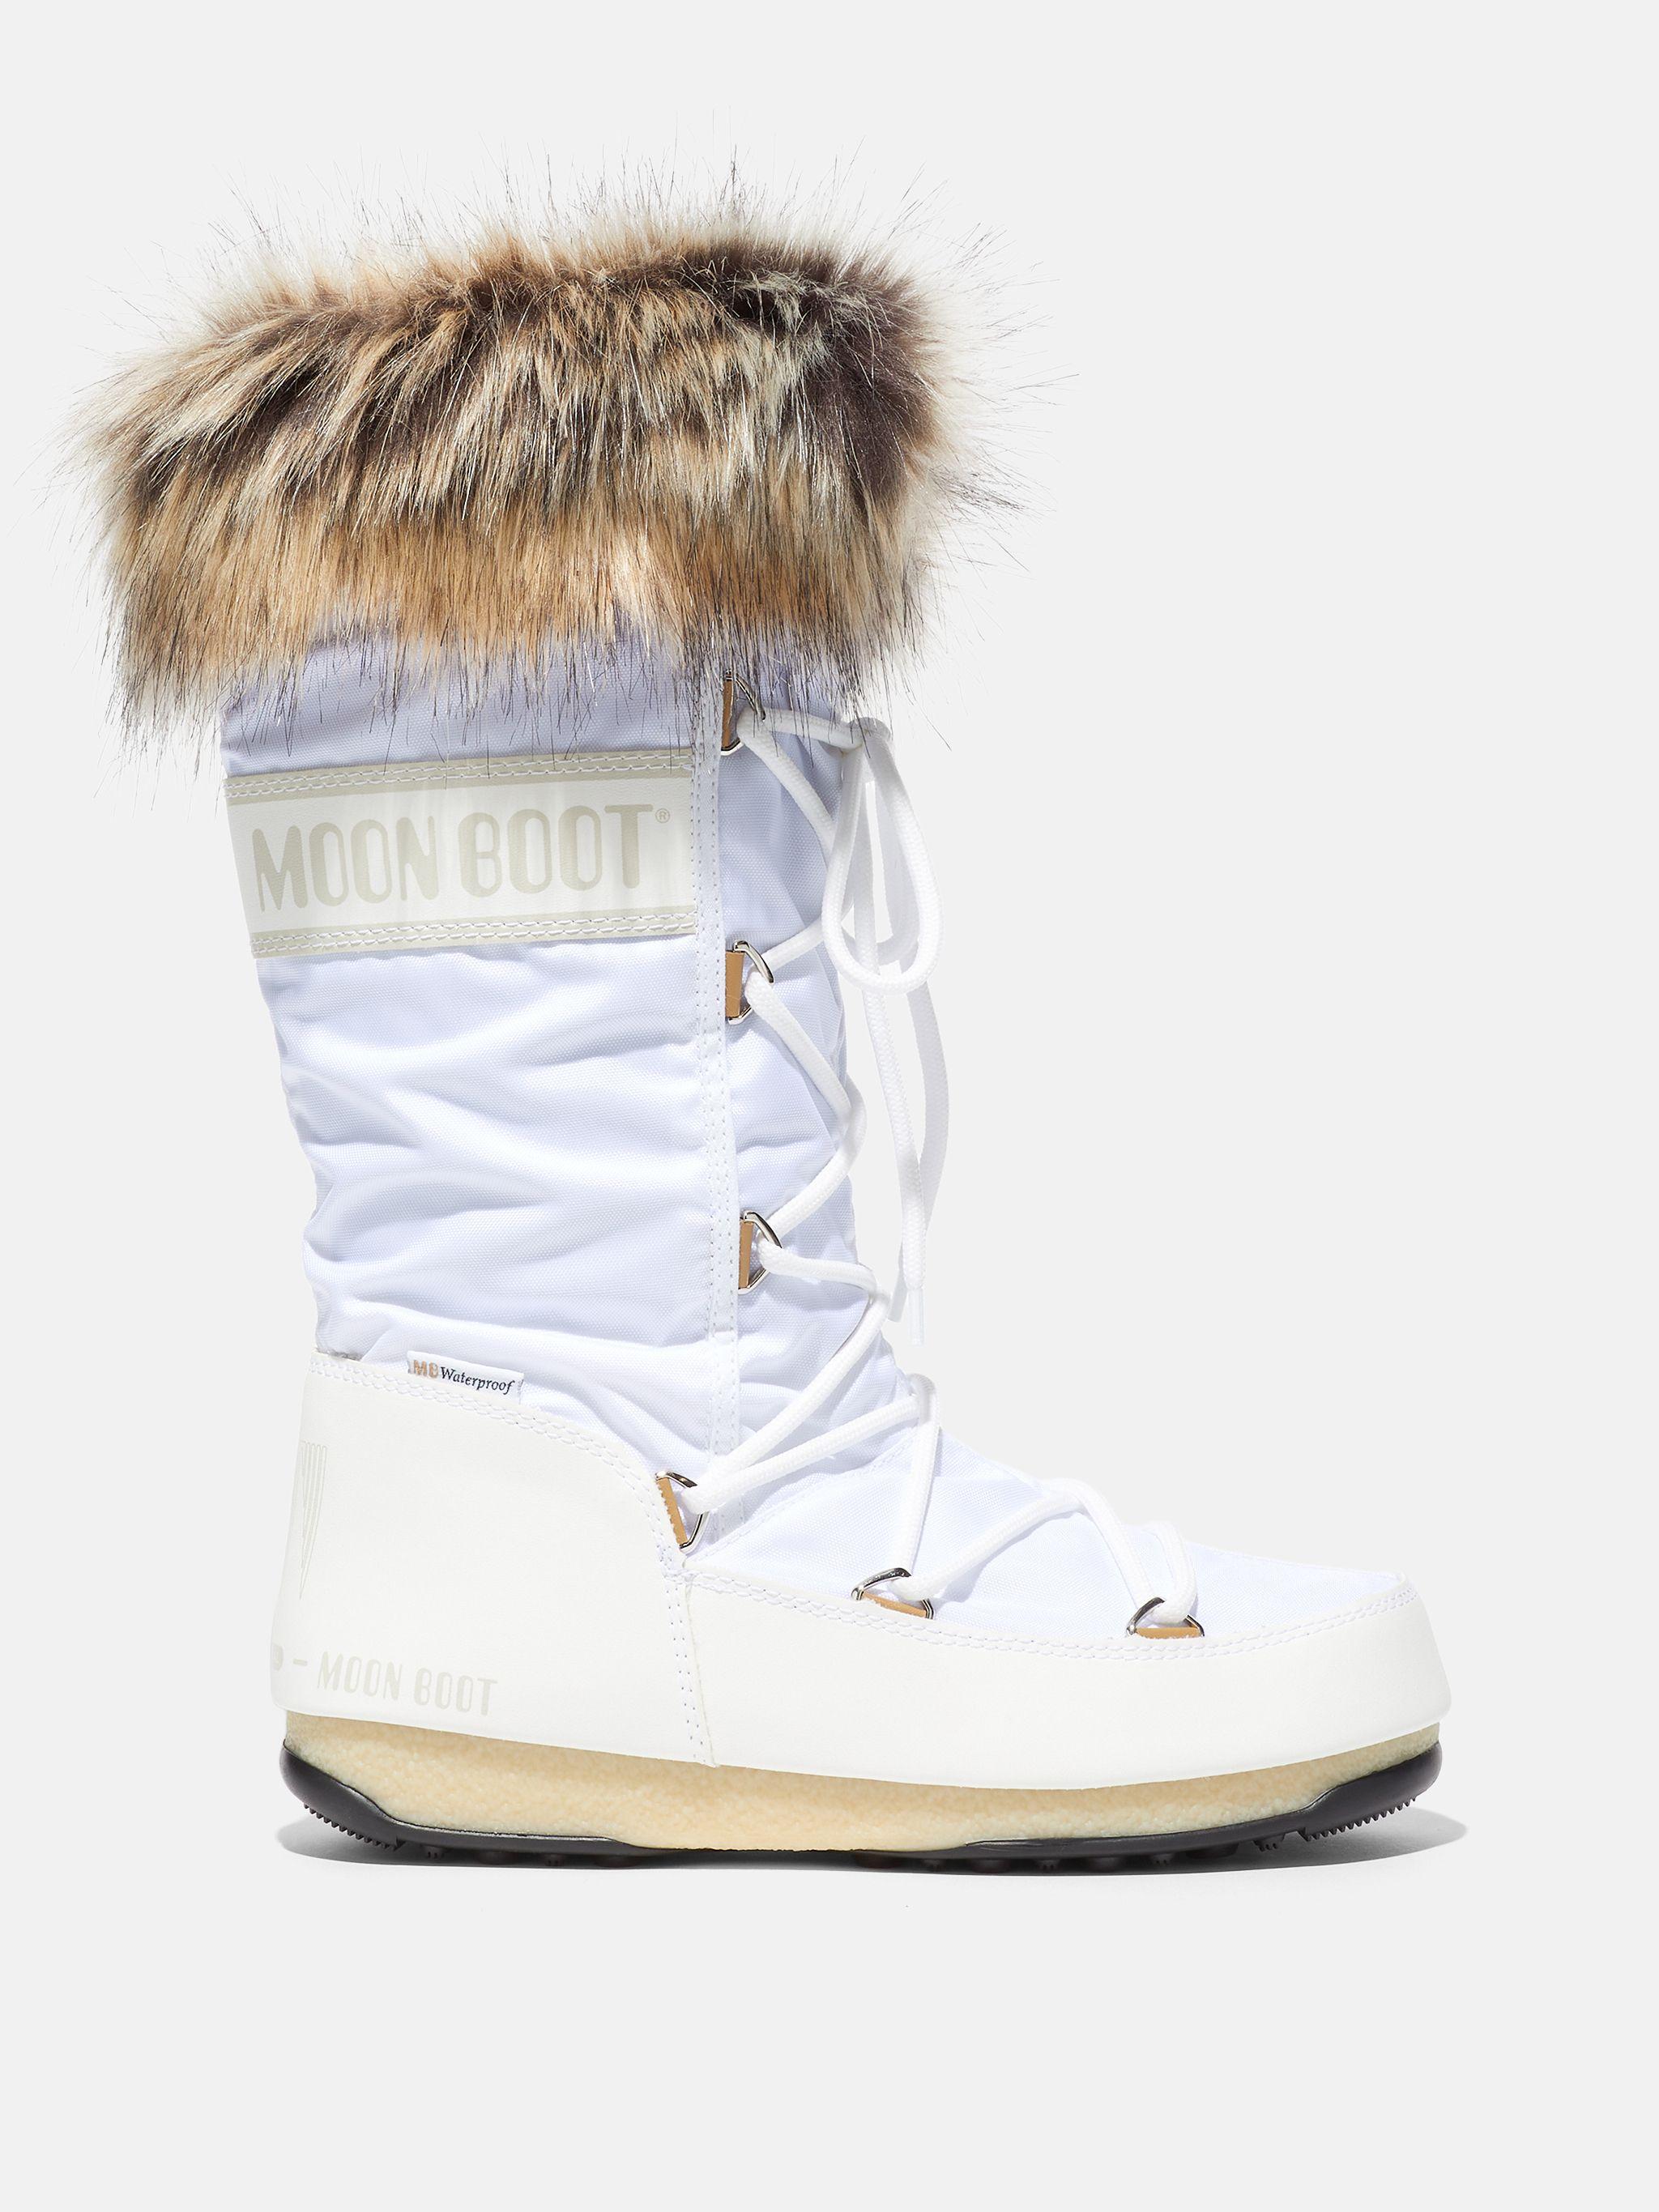 PROTECHT HI-TOP MONACO WHITE BOOTS